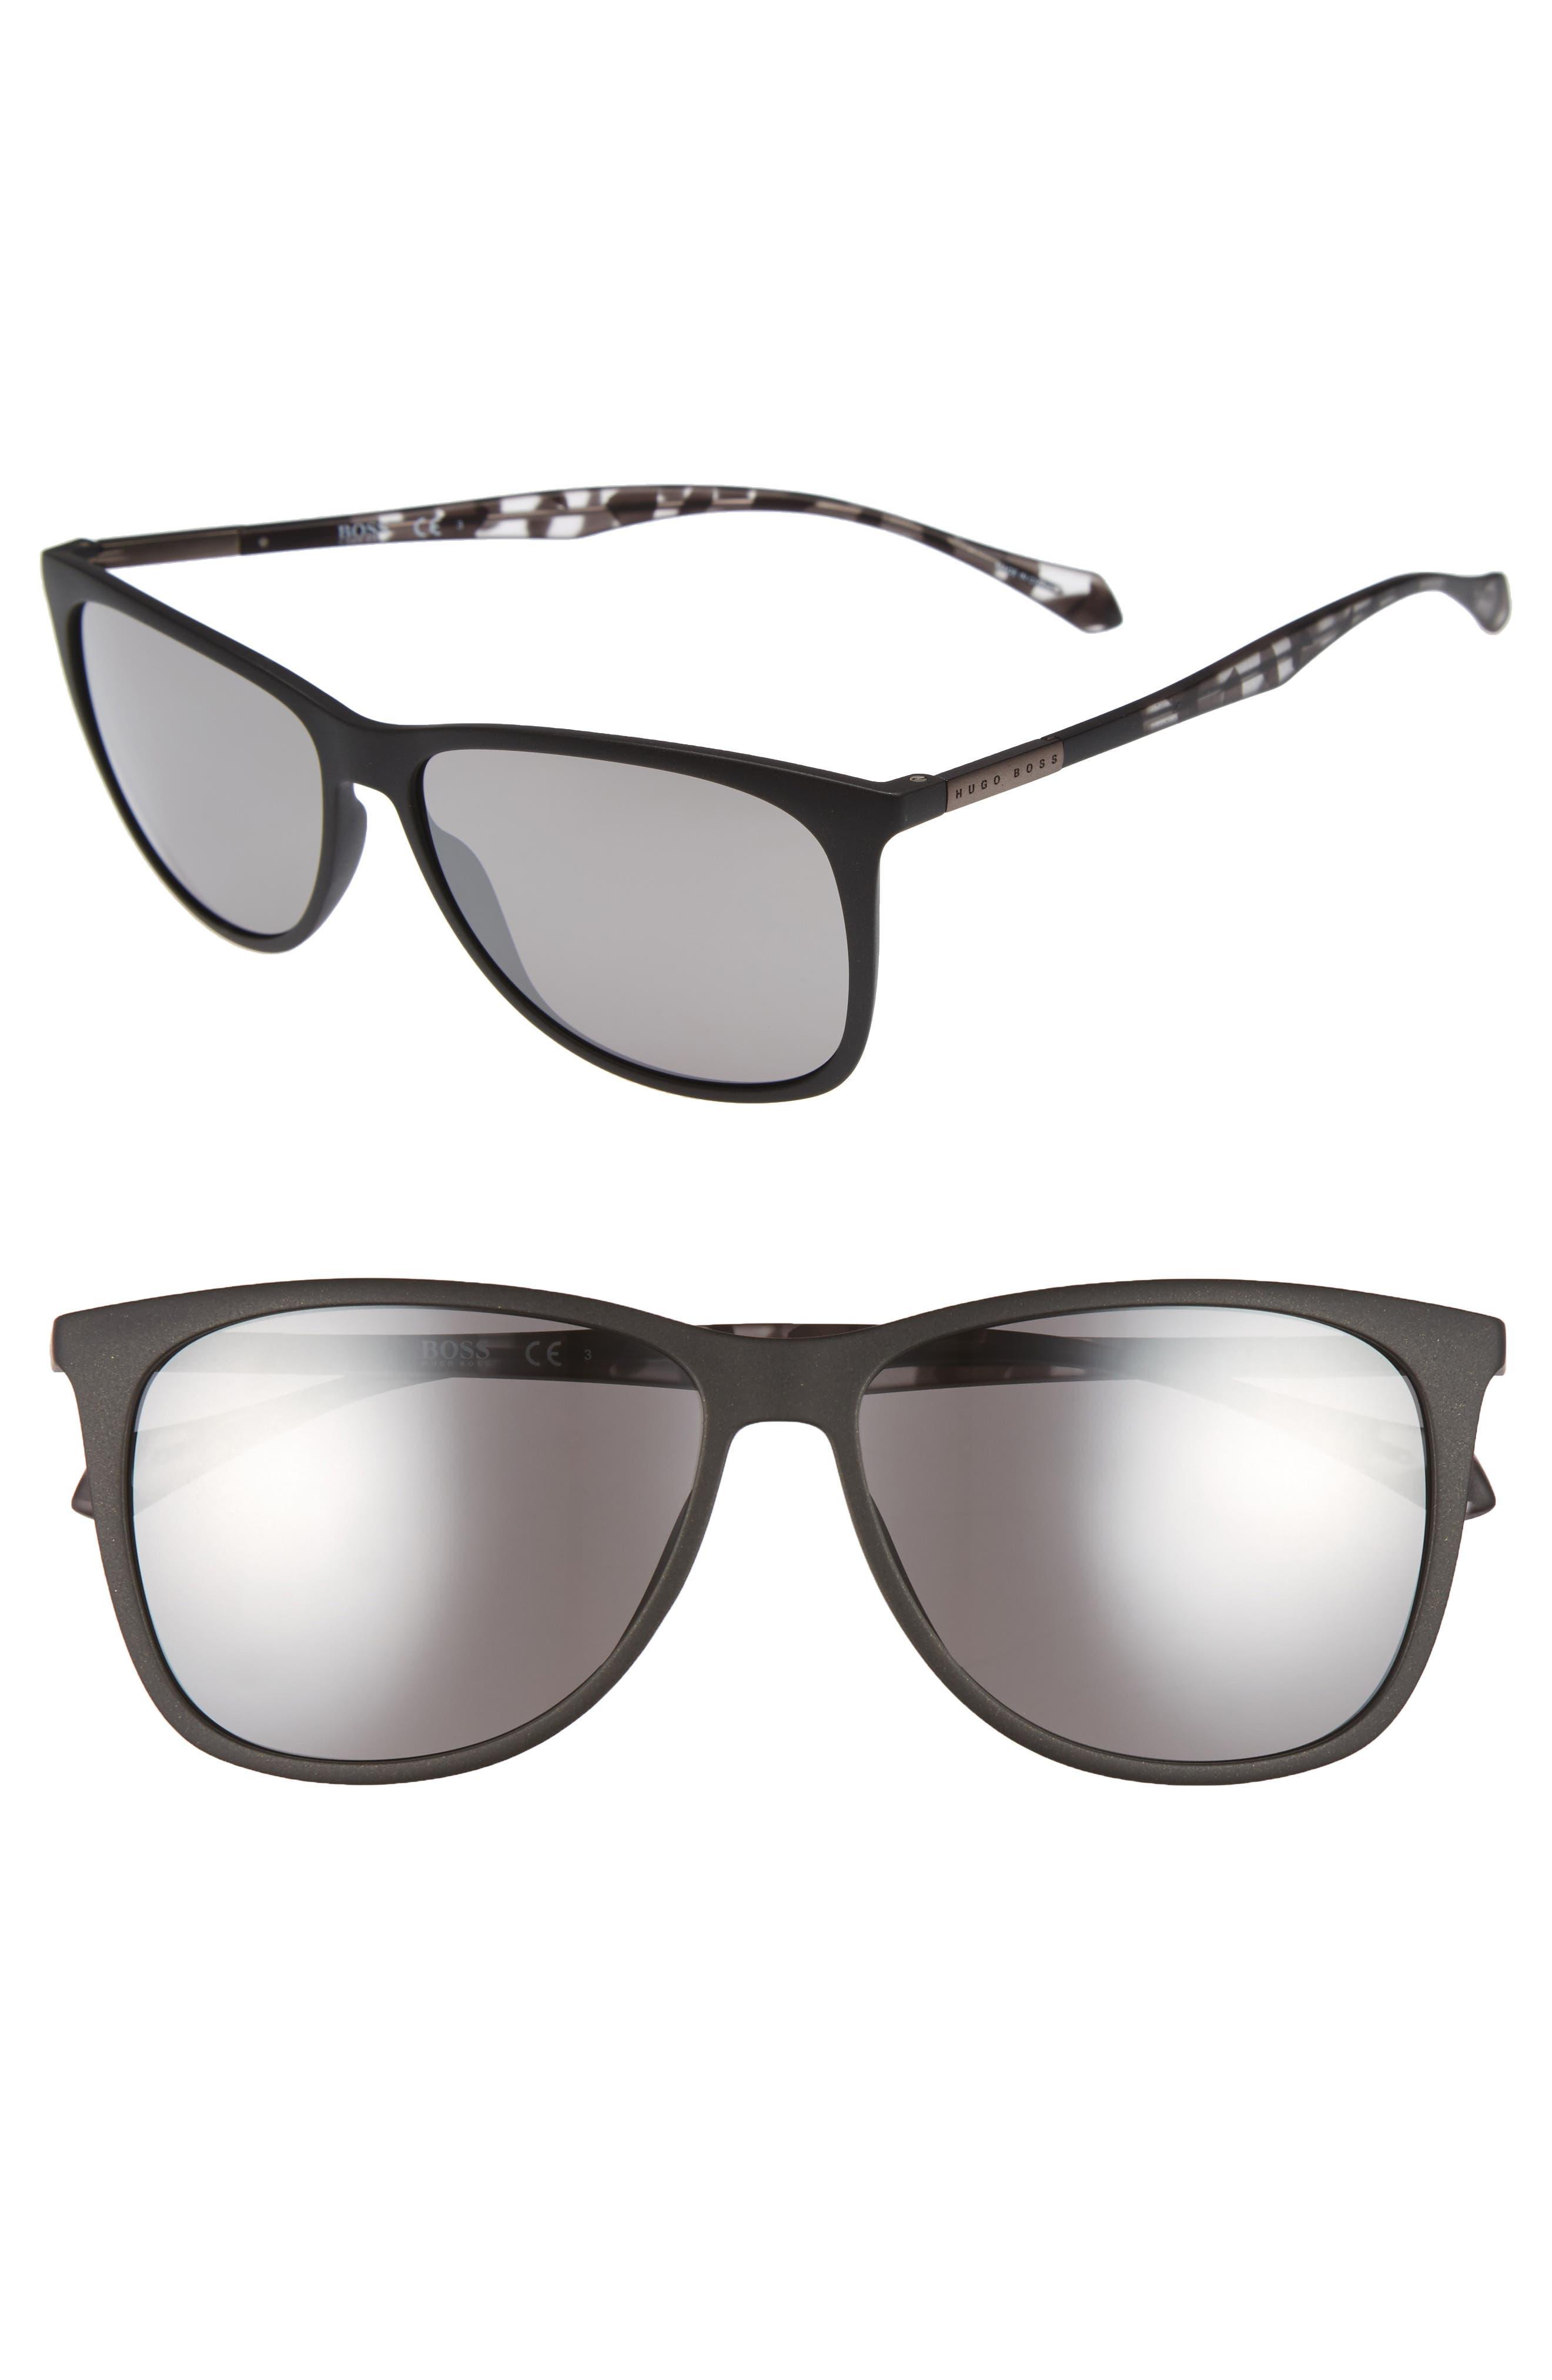 Main Image - BOSS 58mm Sunglasses